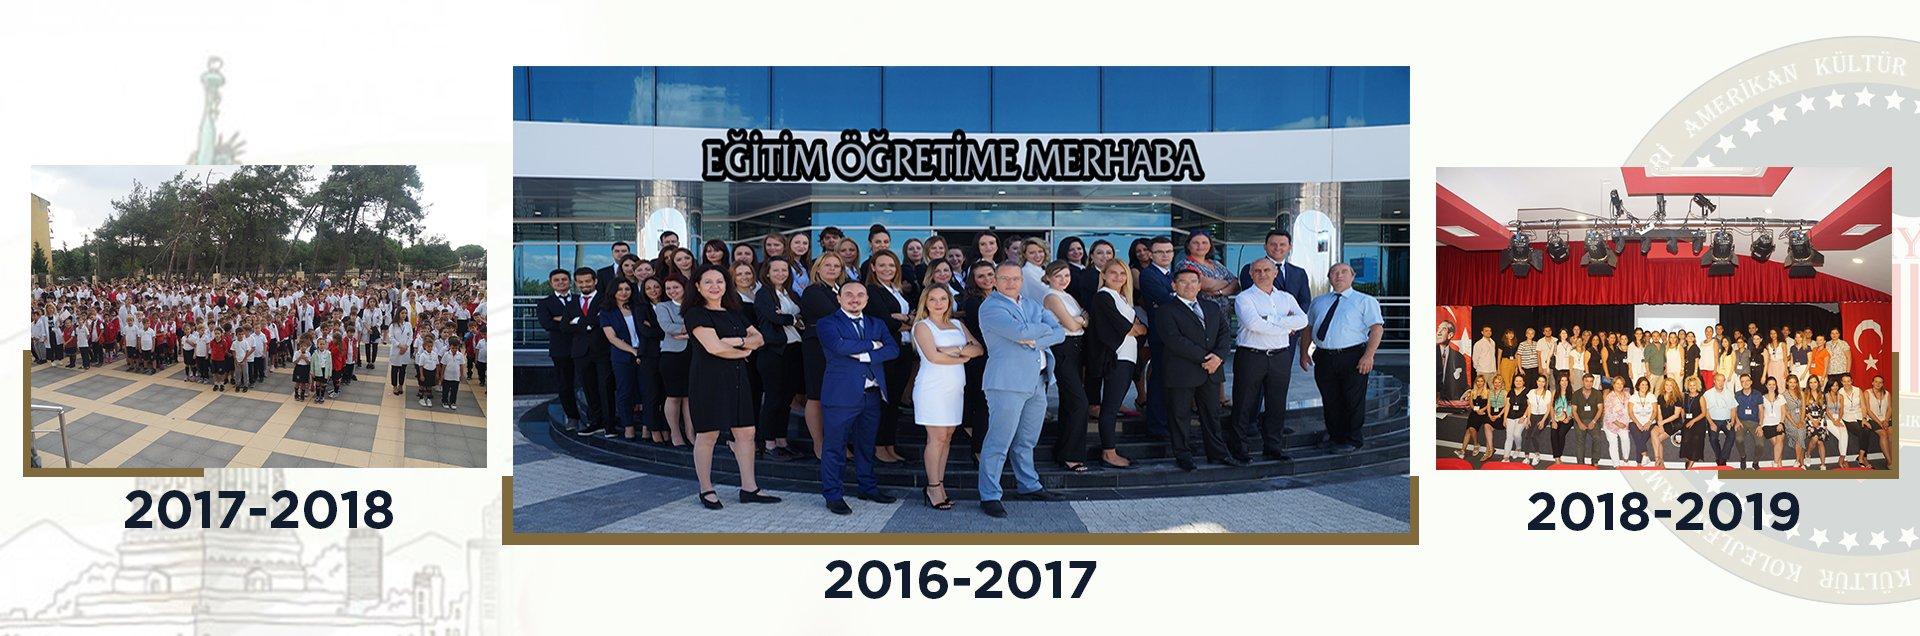 amerikan-kultur-egitim-2018-2019